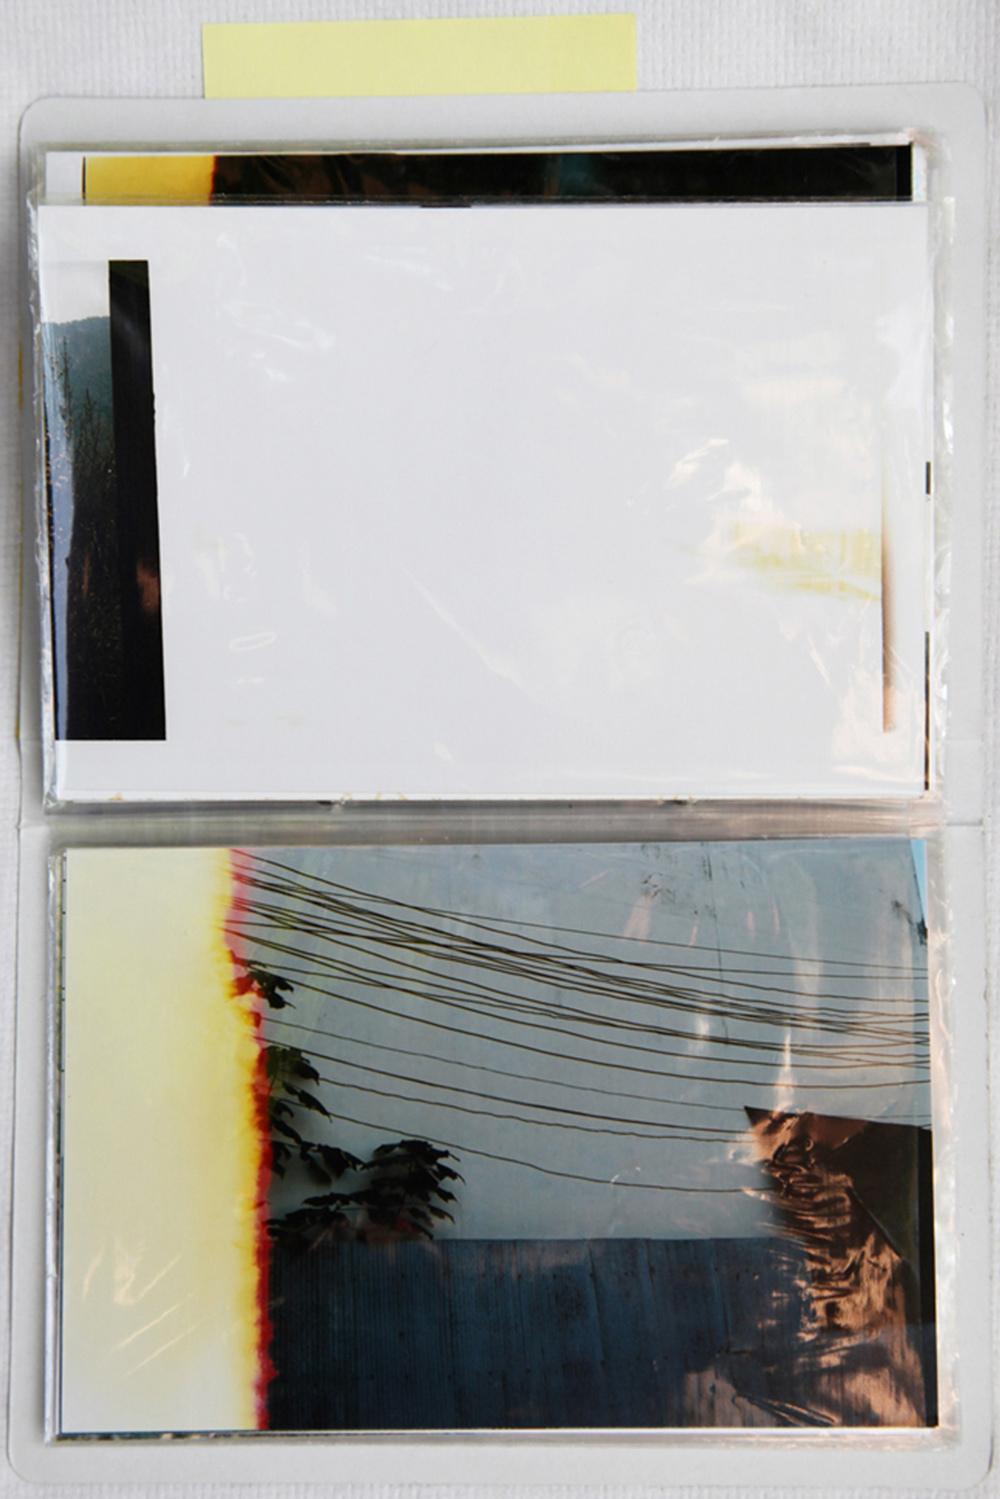 melanie-jayne-taylor-concretepost-2015-5.jpg